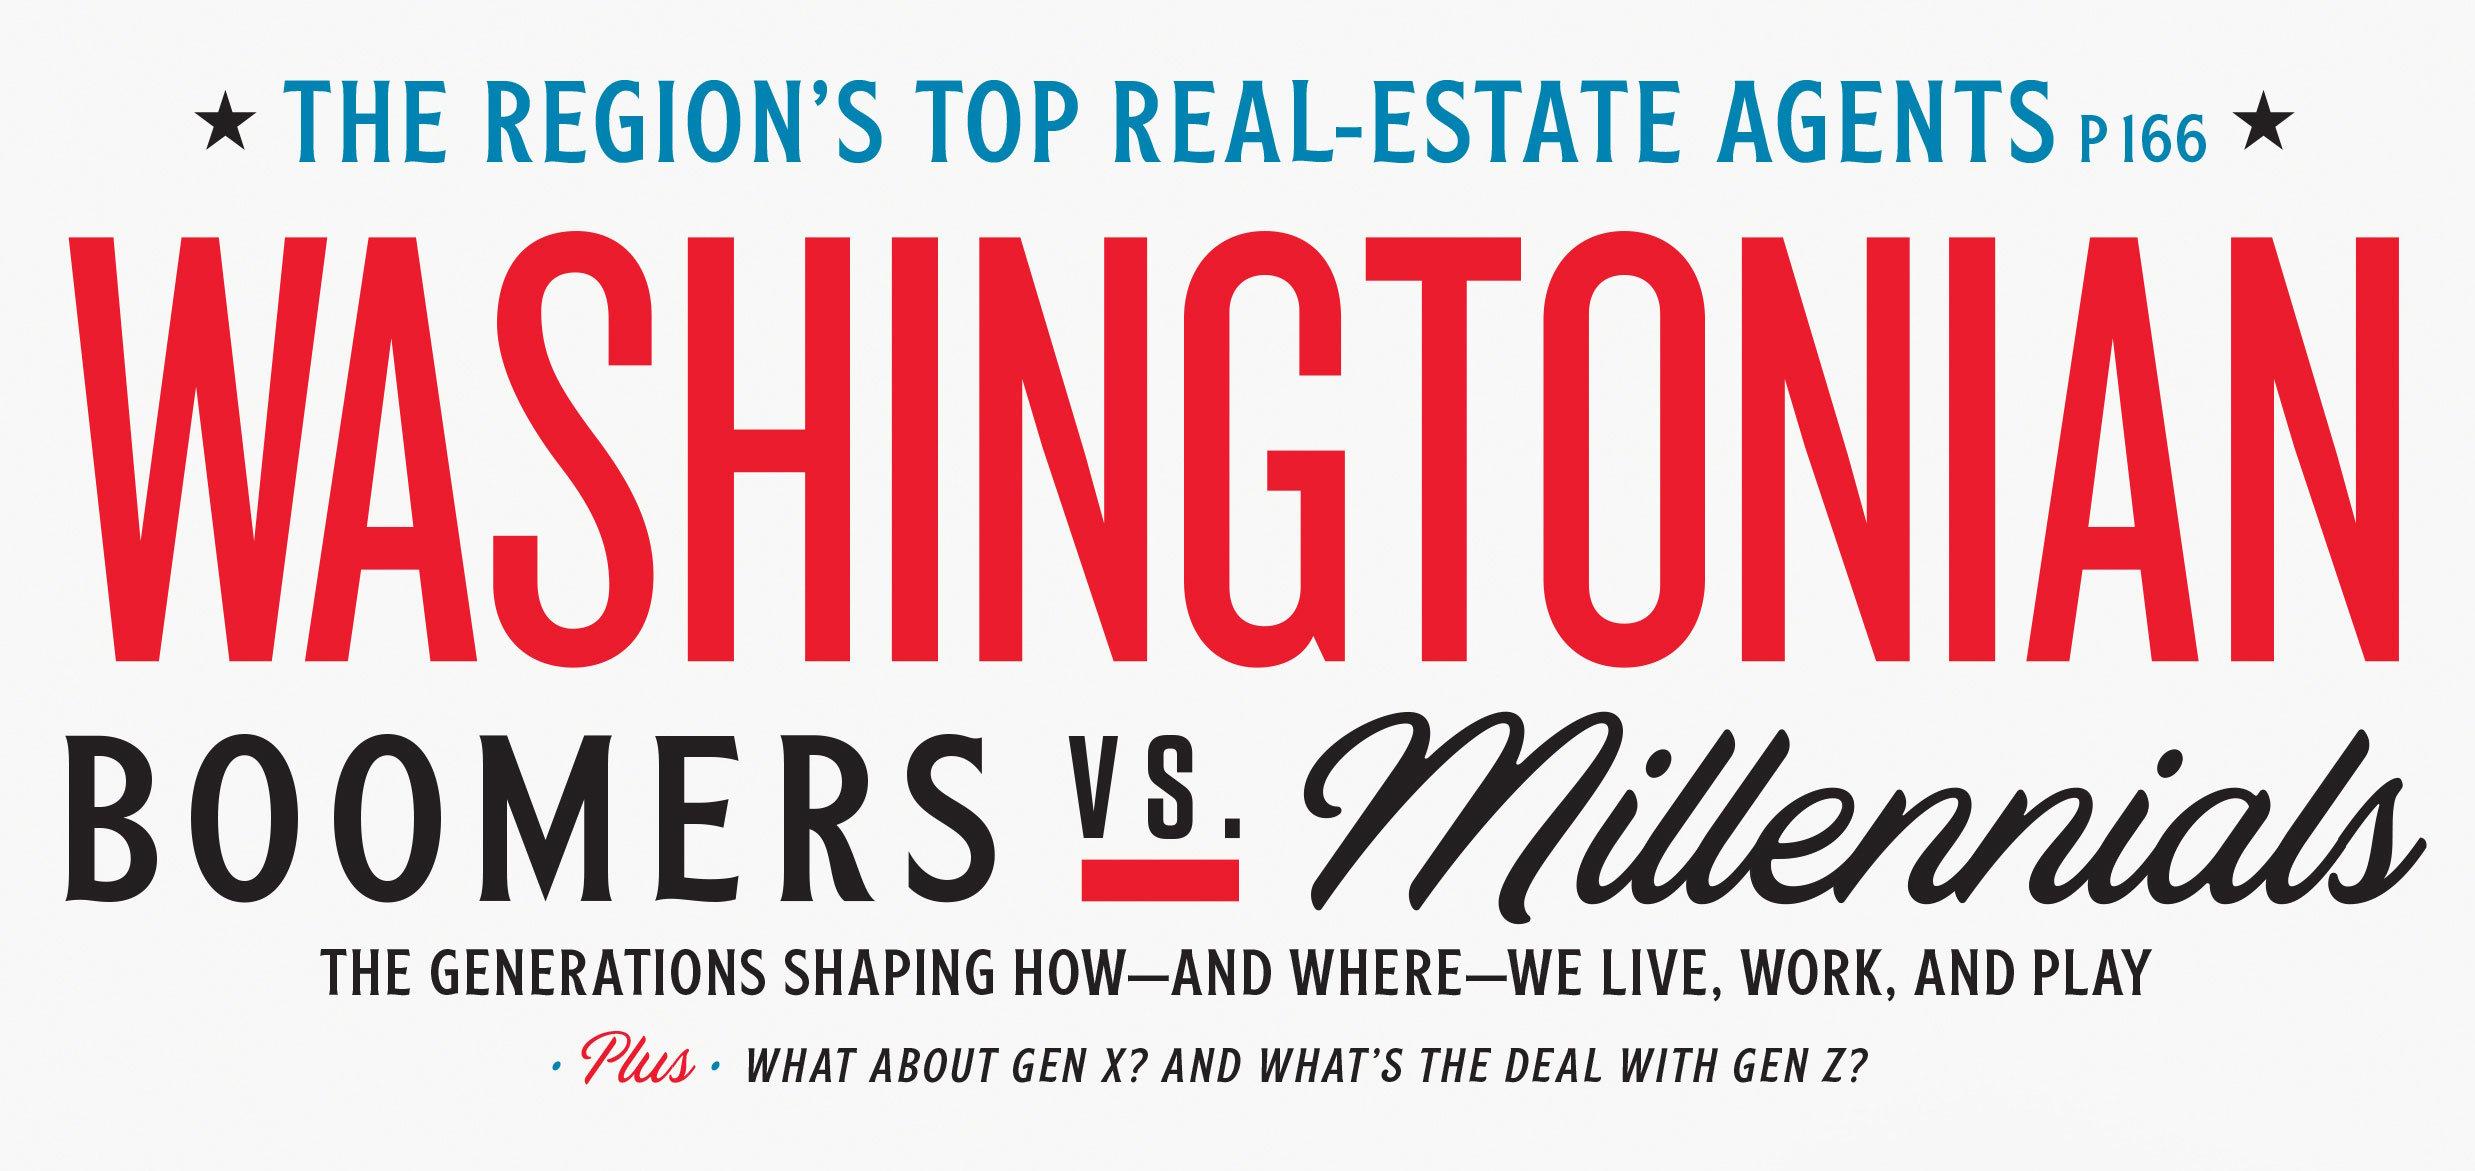 July 2019: Boomers vs. Millennials | Washingtonian (DC)